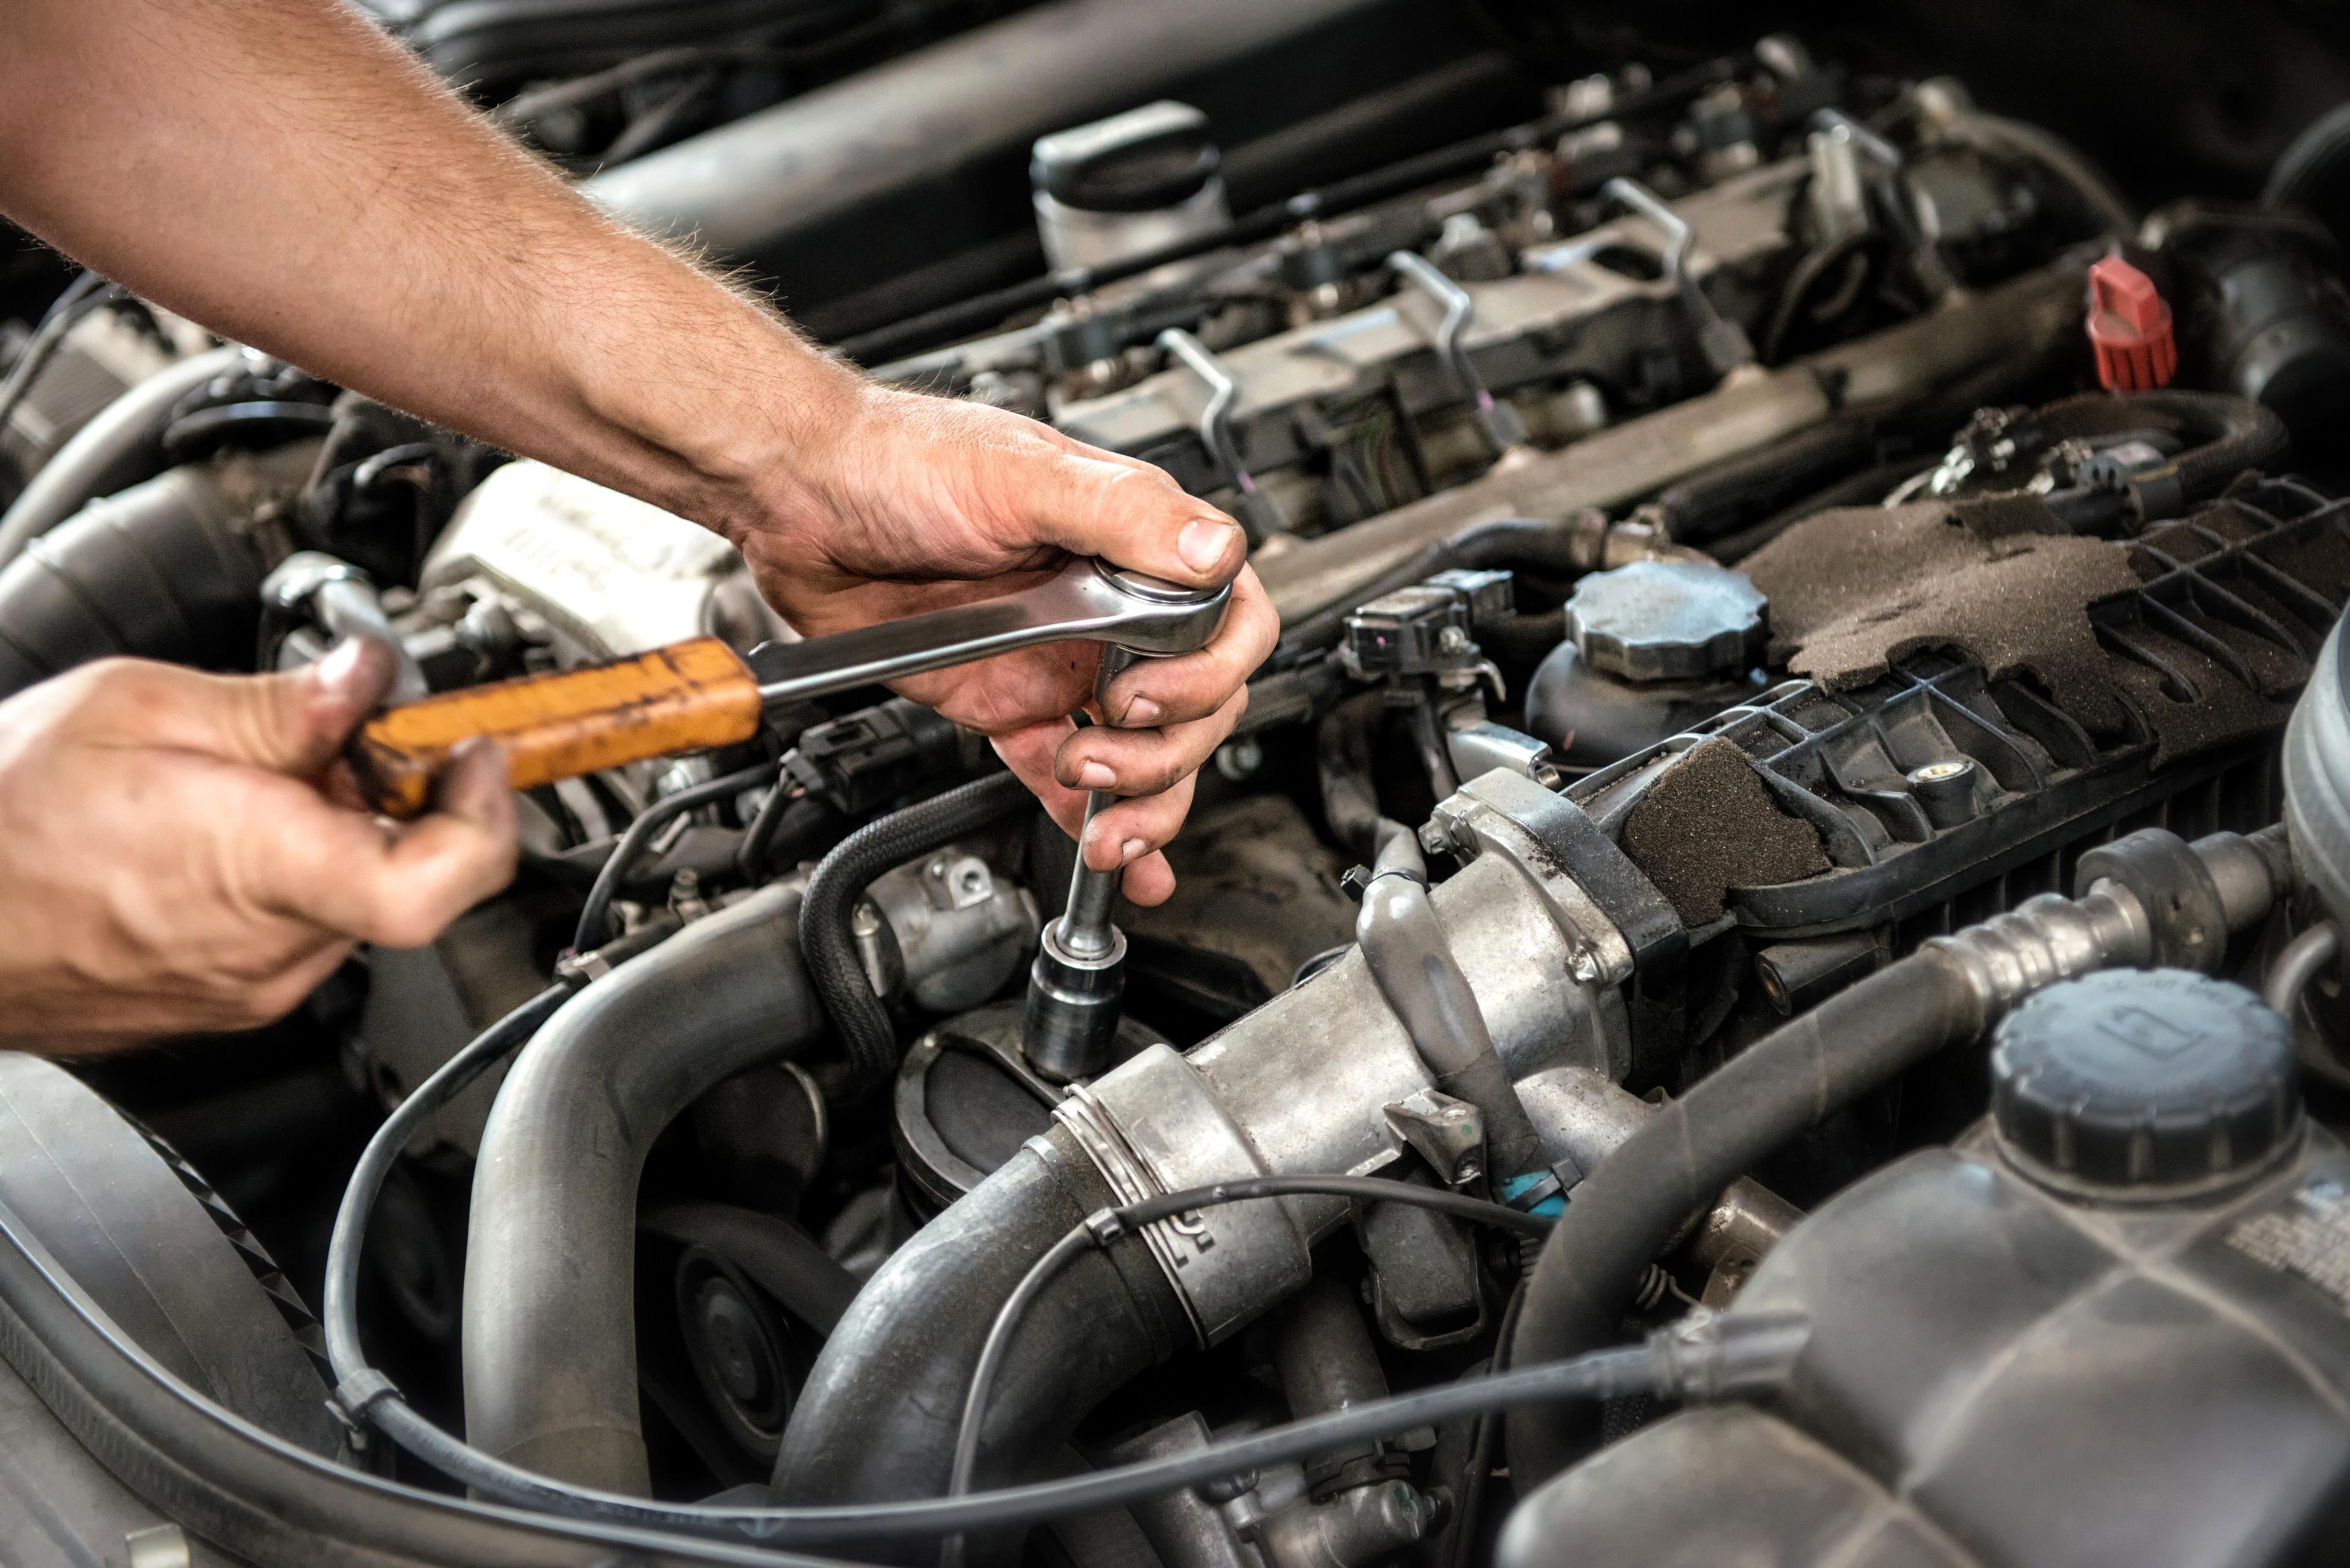 alternative complete specialize we original va service volvo at providing mechanic services depositphotos auto in repair alexandria for dealership lorton and